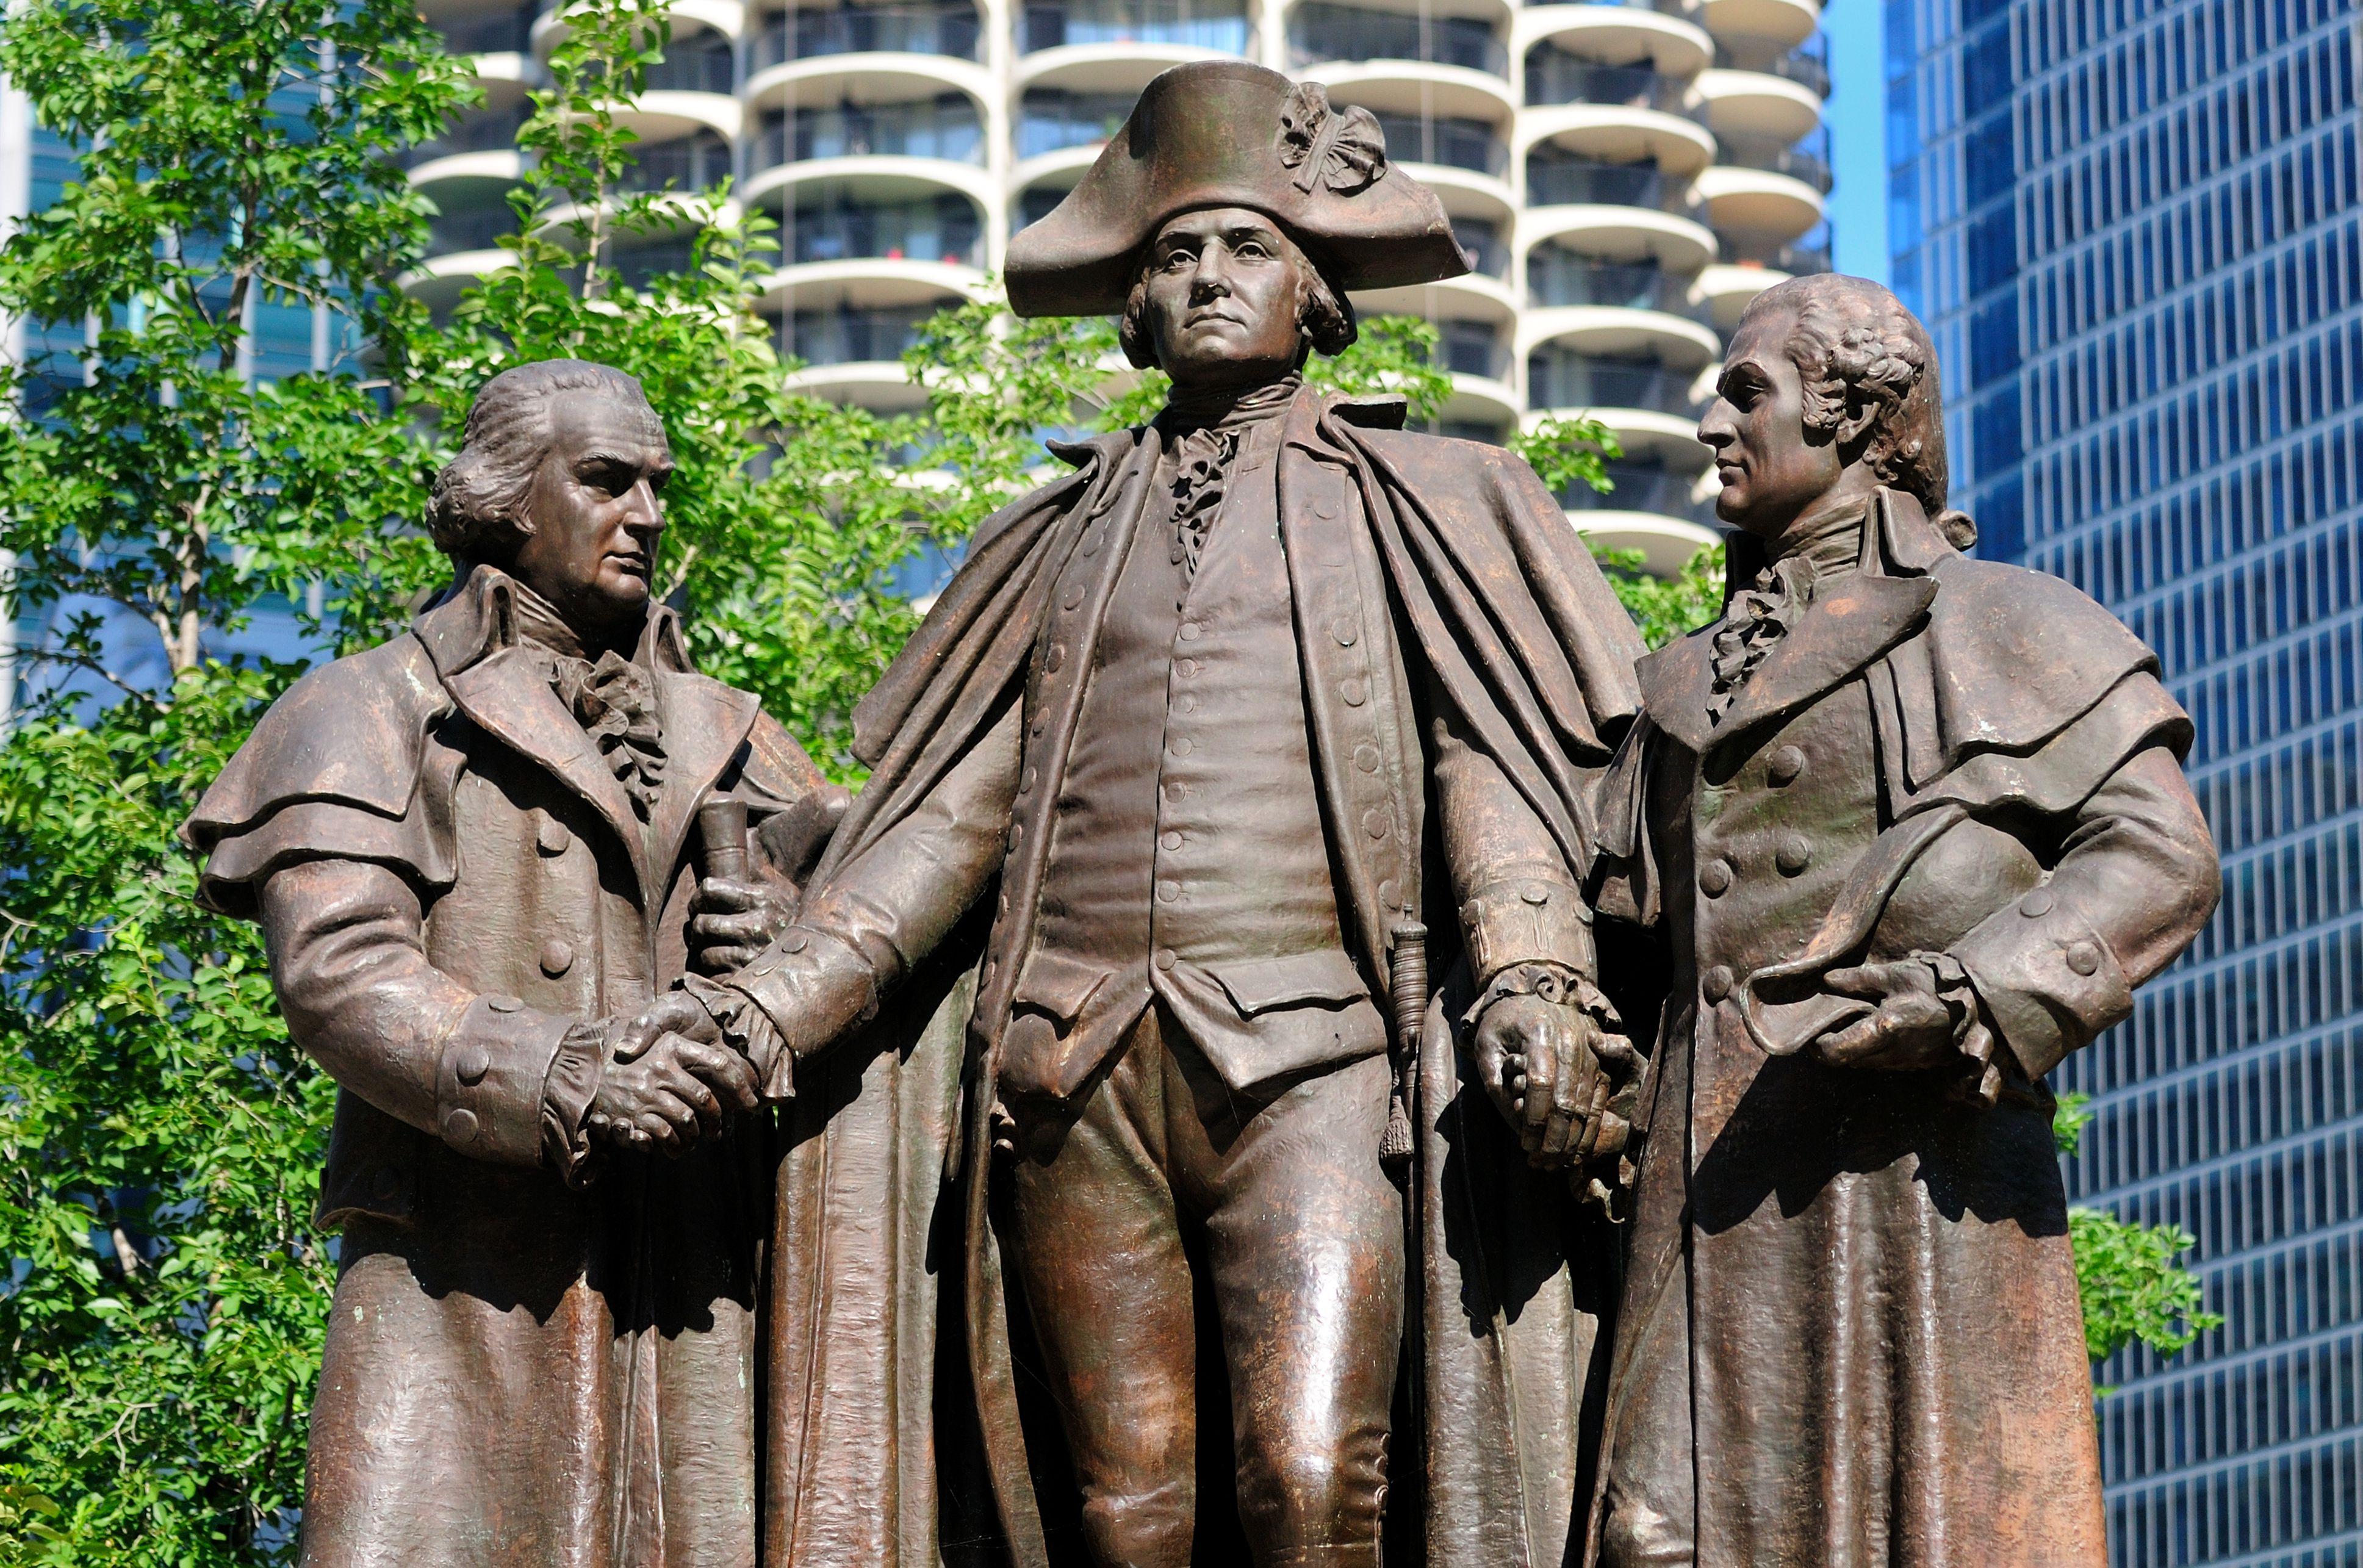 Statue of Robert Morris, George Washington and Haym Salomon rests on Wacker Drive, Chicago, Illinois, USA